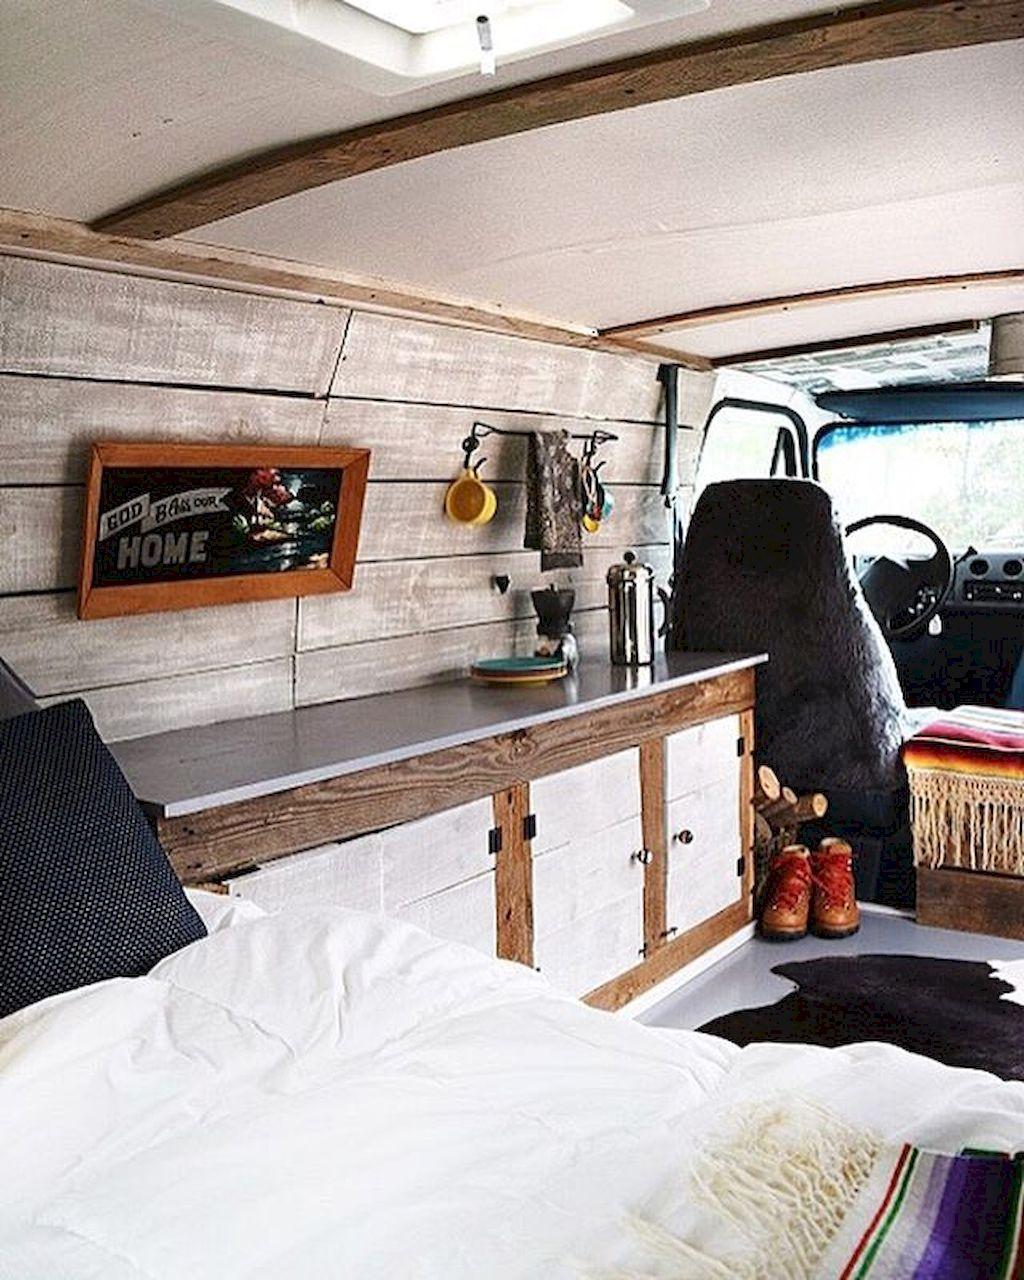 Camper Van Interior Design And Organization Ideas 68